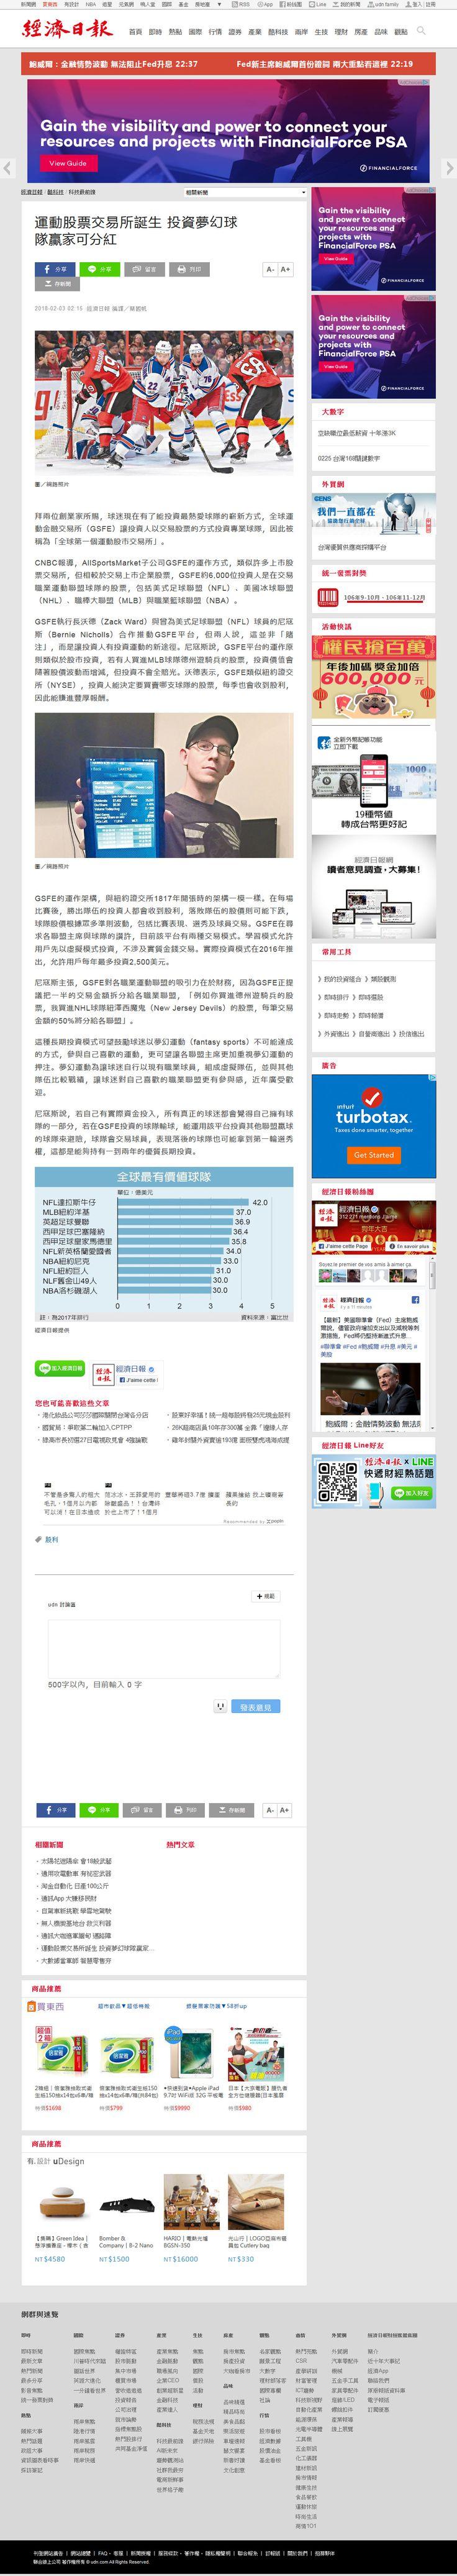 AllSportsMarket was featured in a Taiwan Newspaper.